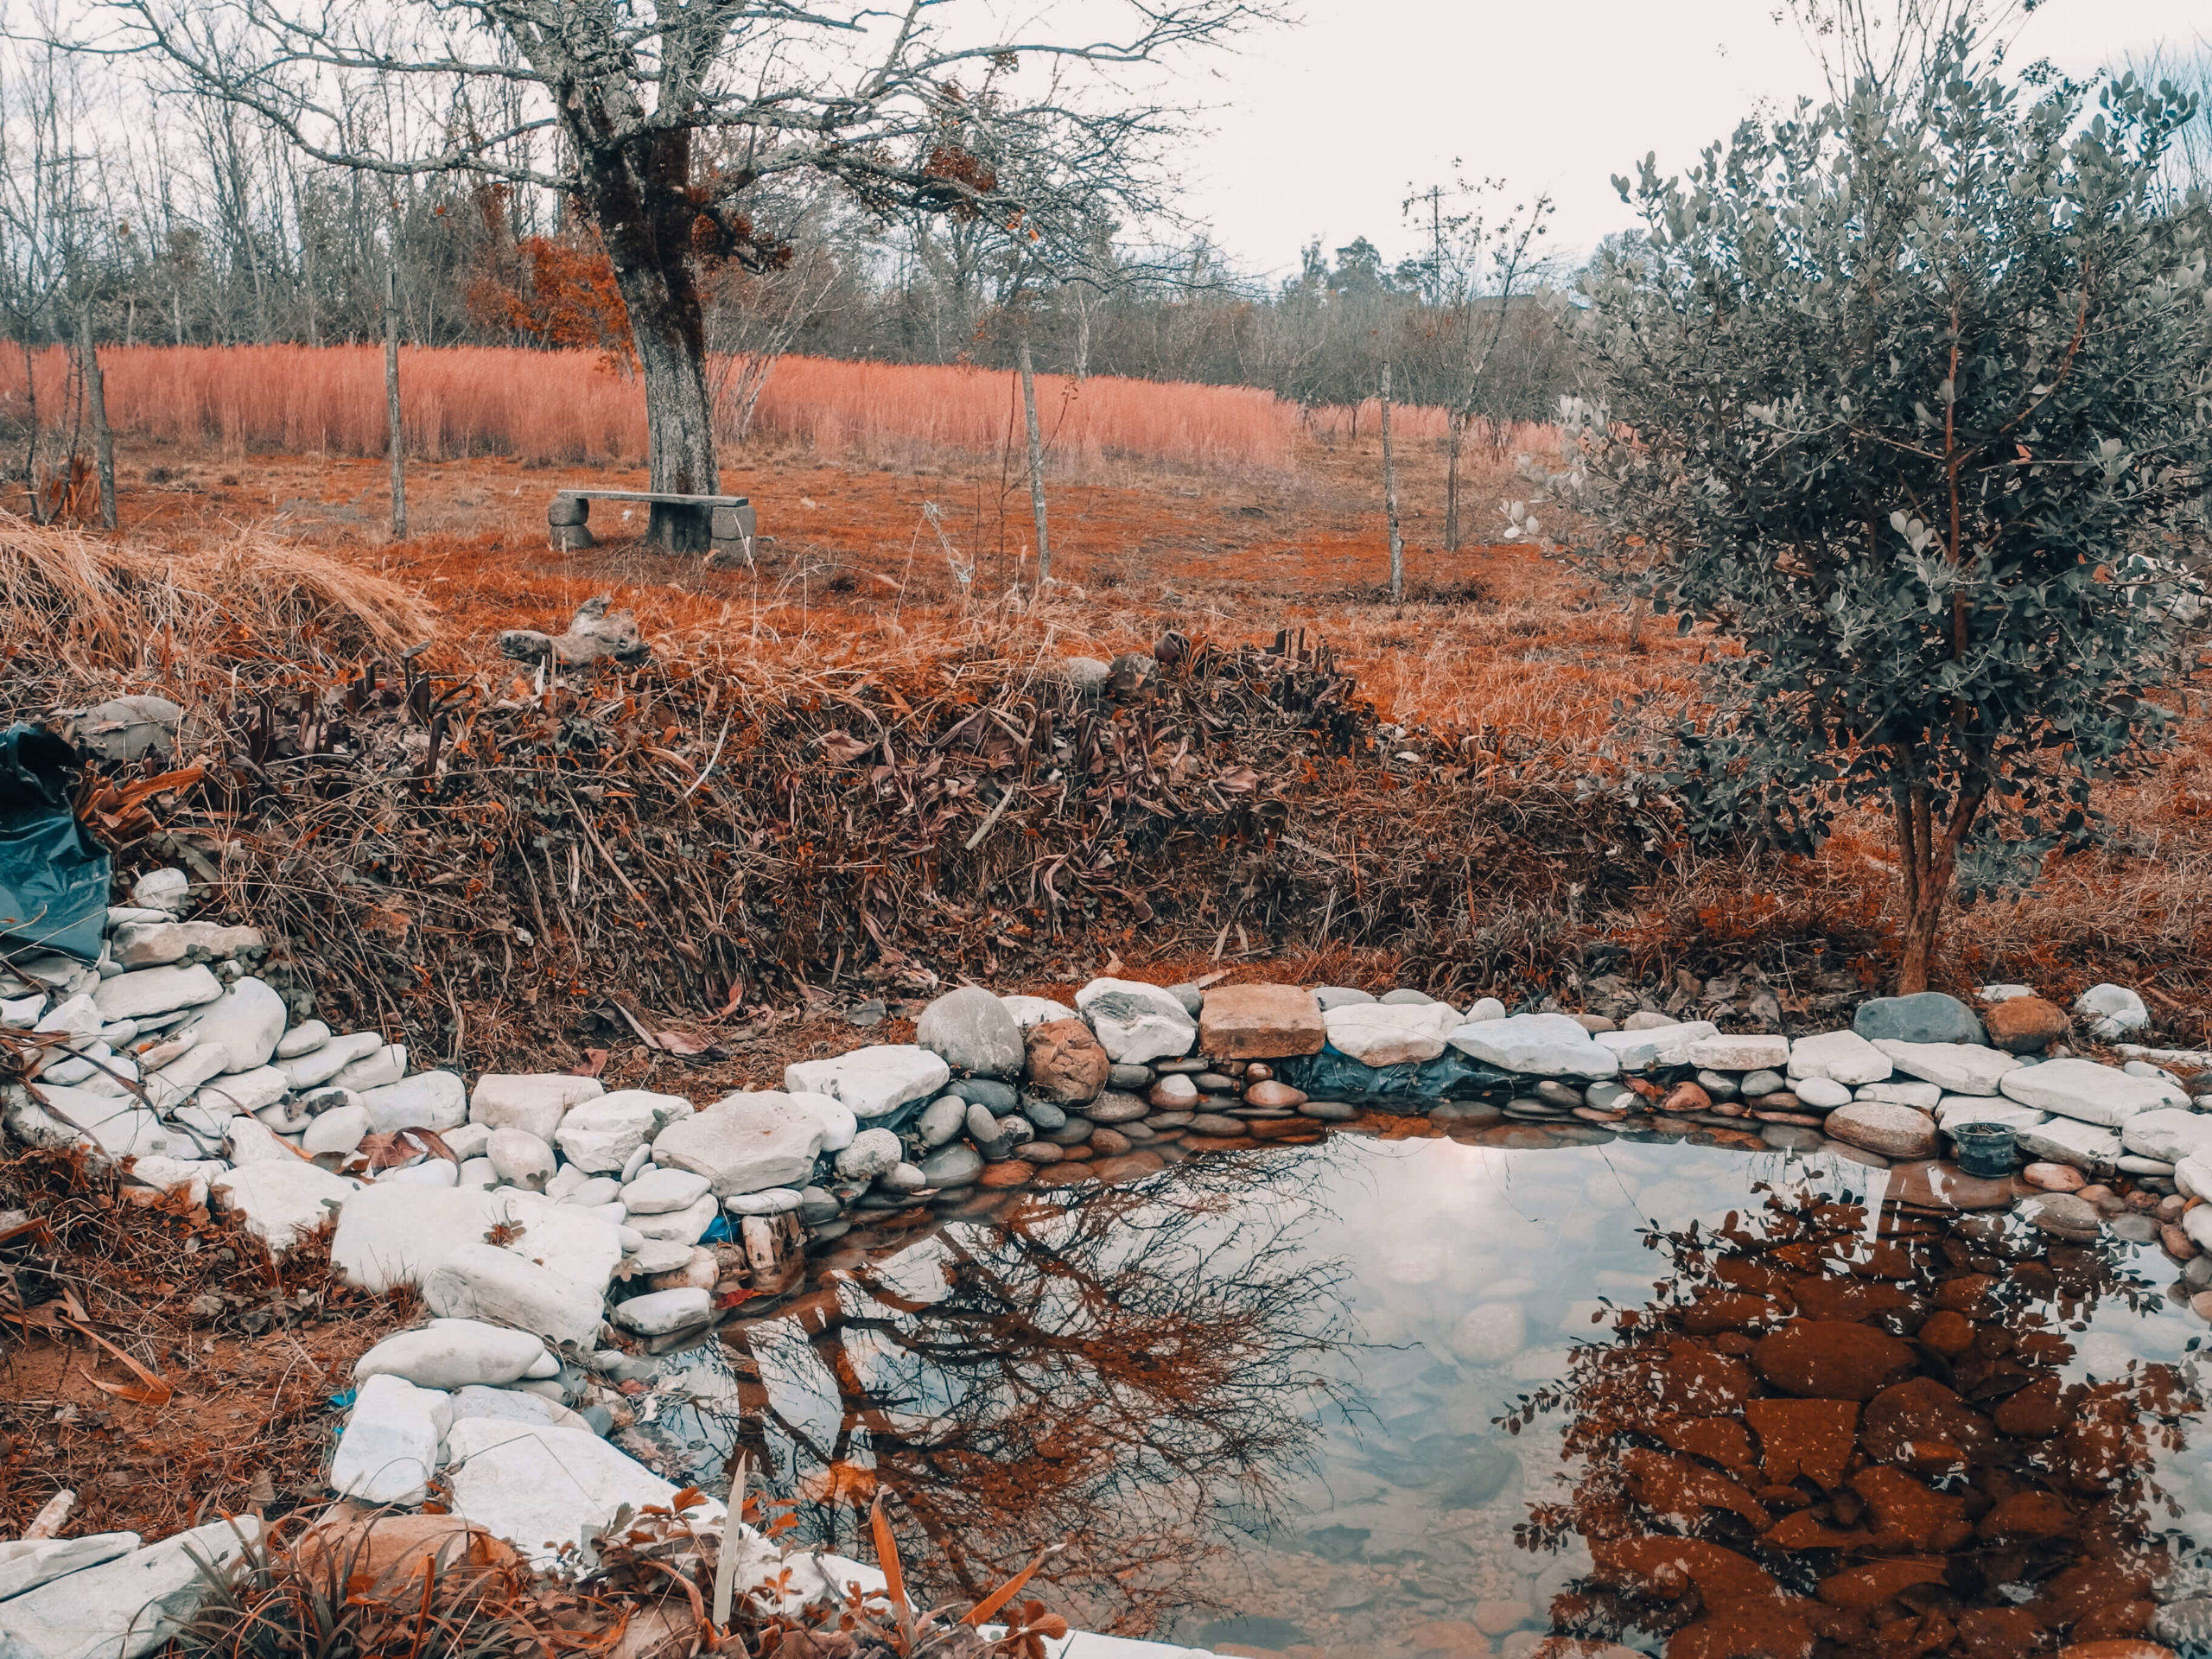 Жизнь на земле. Опыт пермакультуры